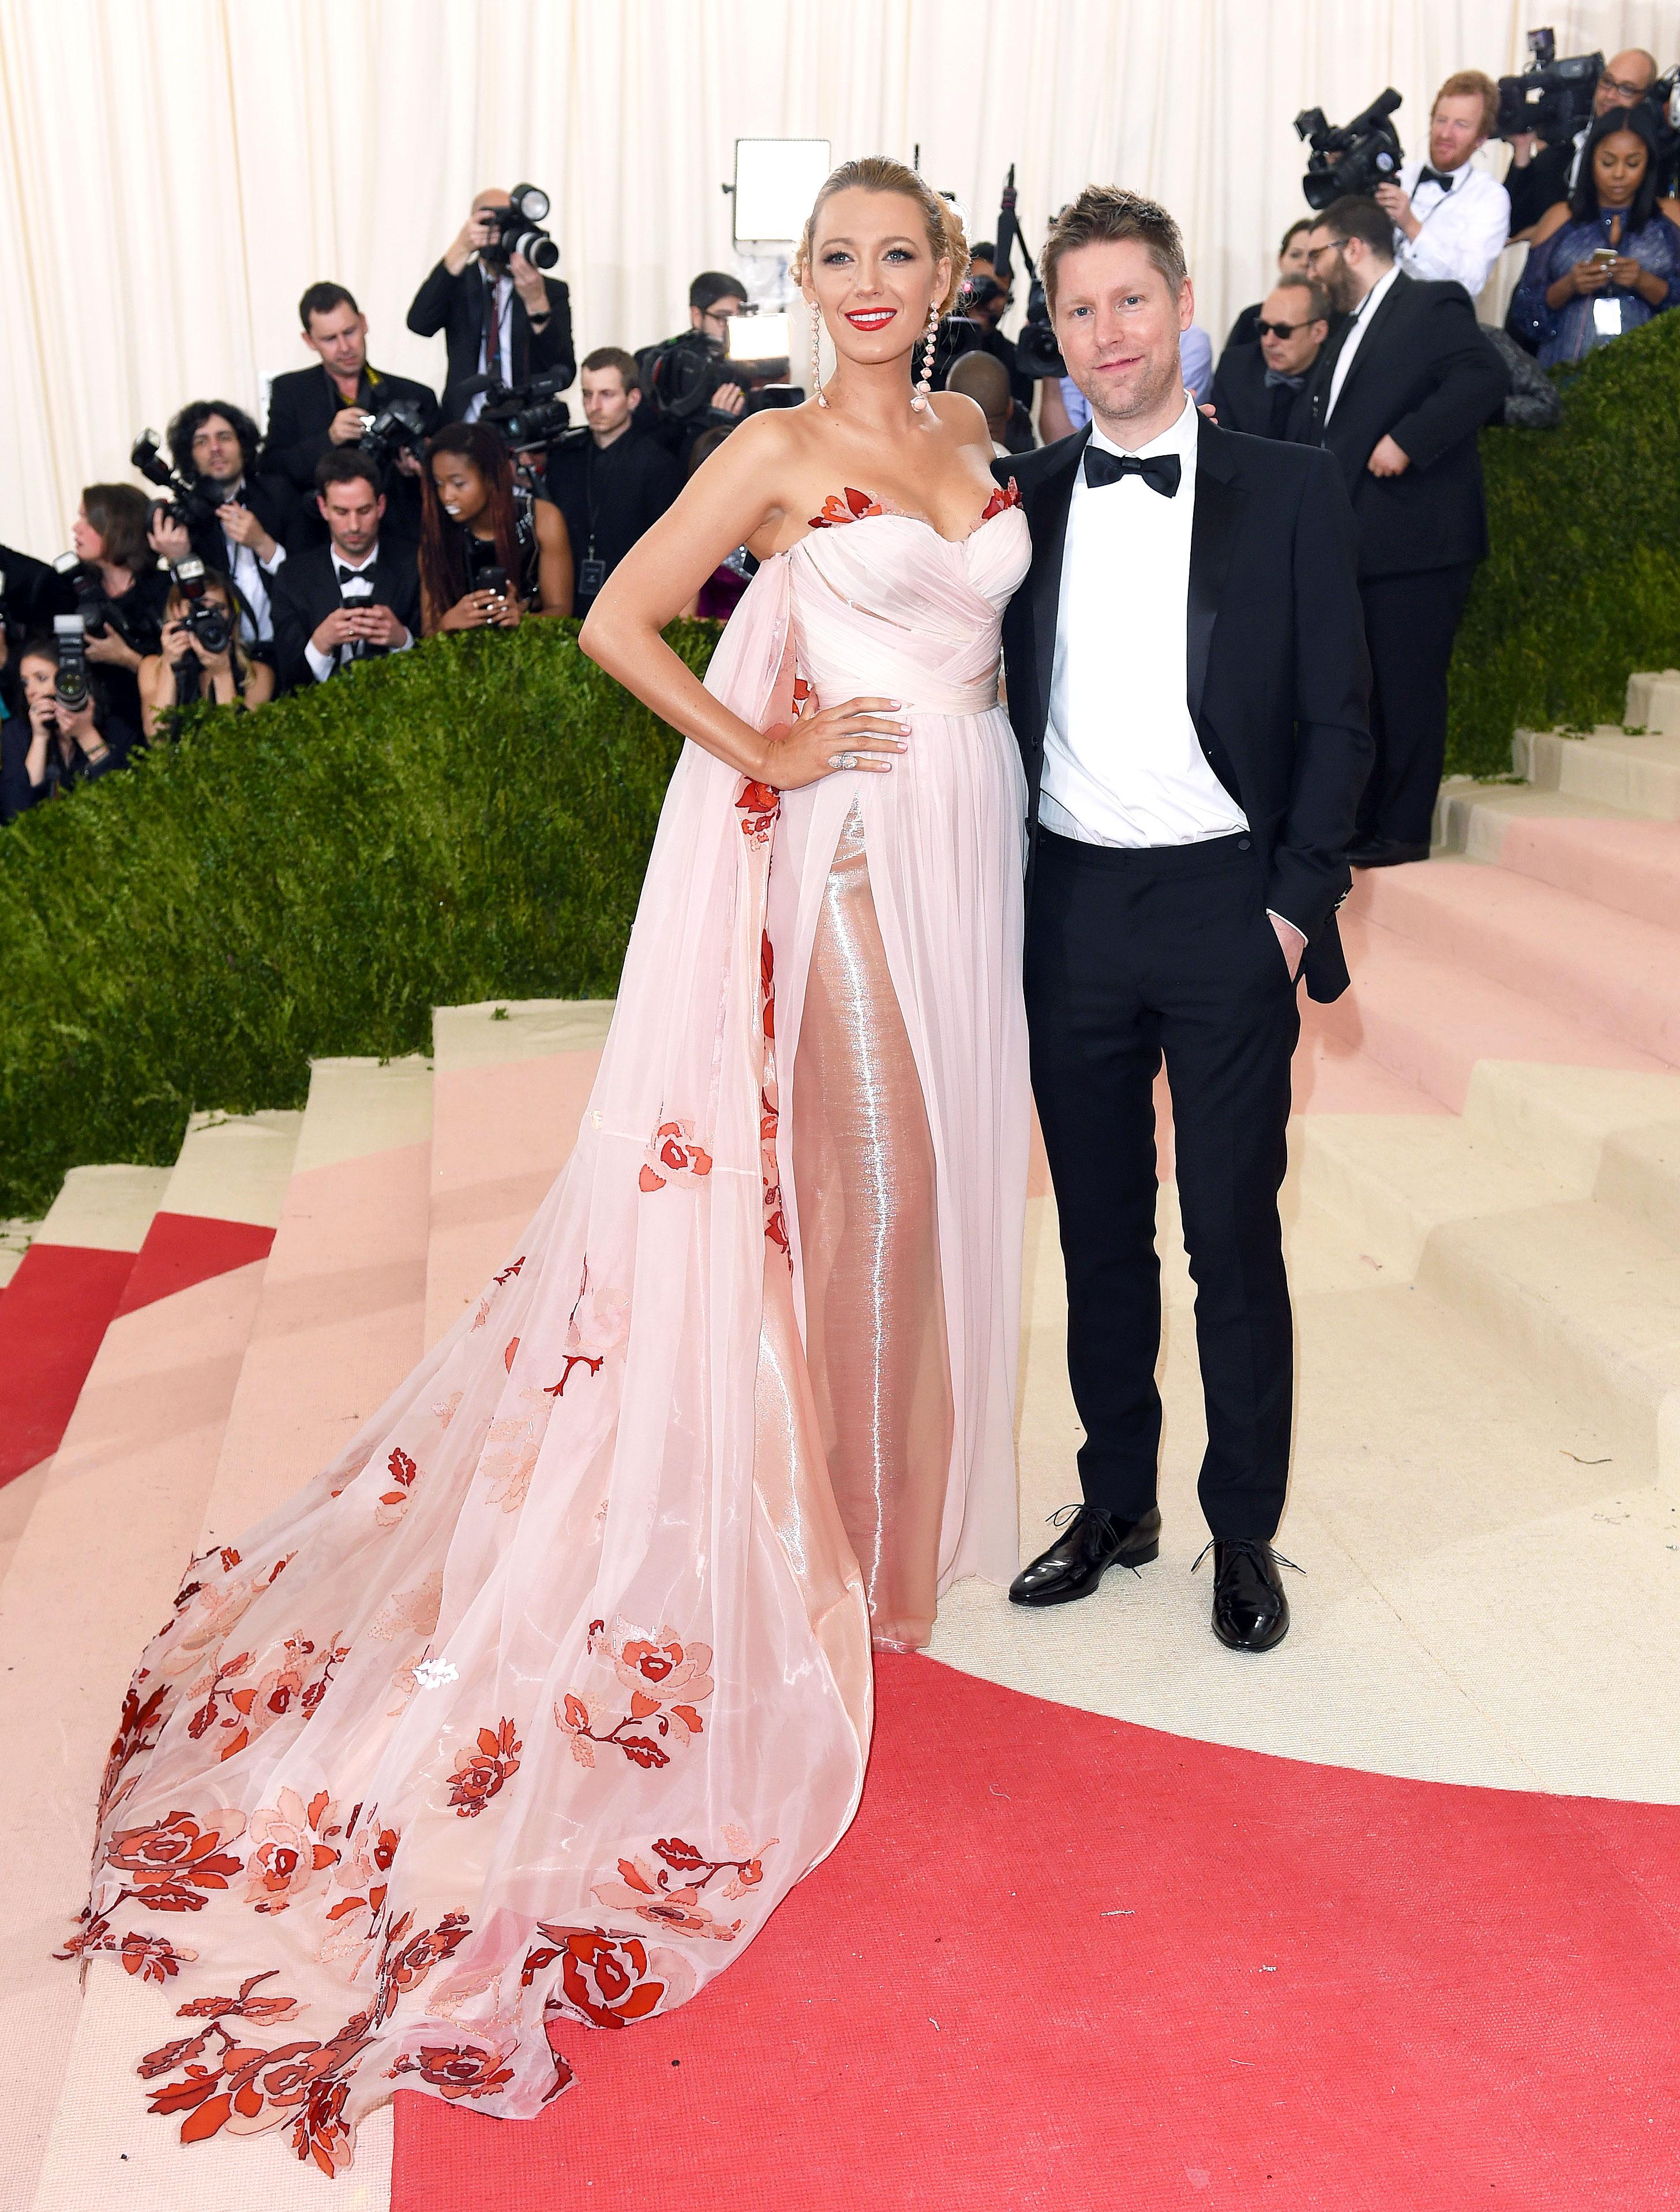 Pregnant Blake Lively Helped Design Her Met Gala 2016 Dress